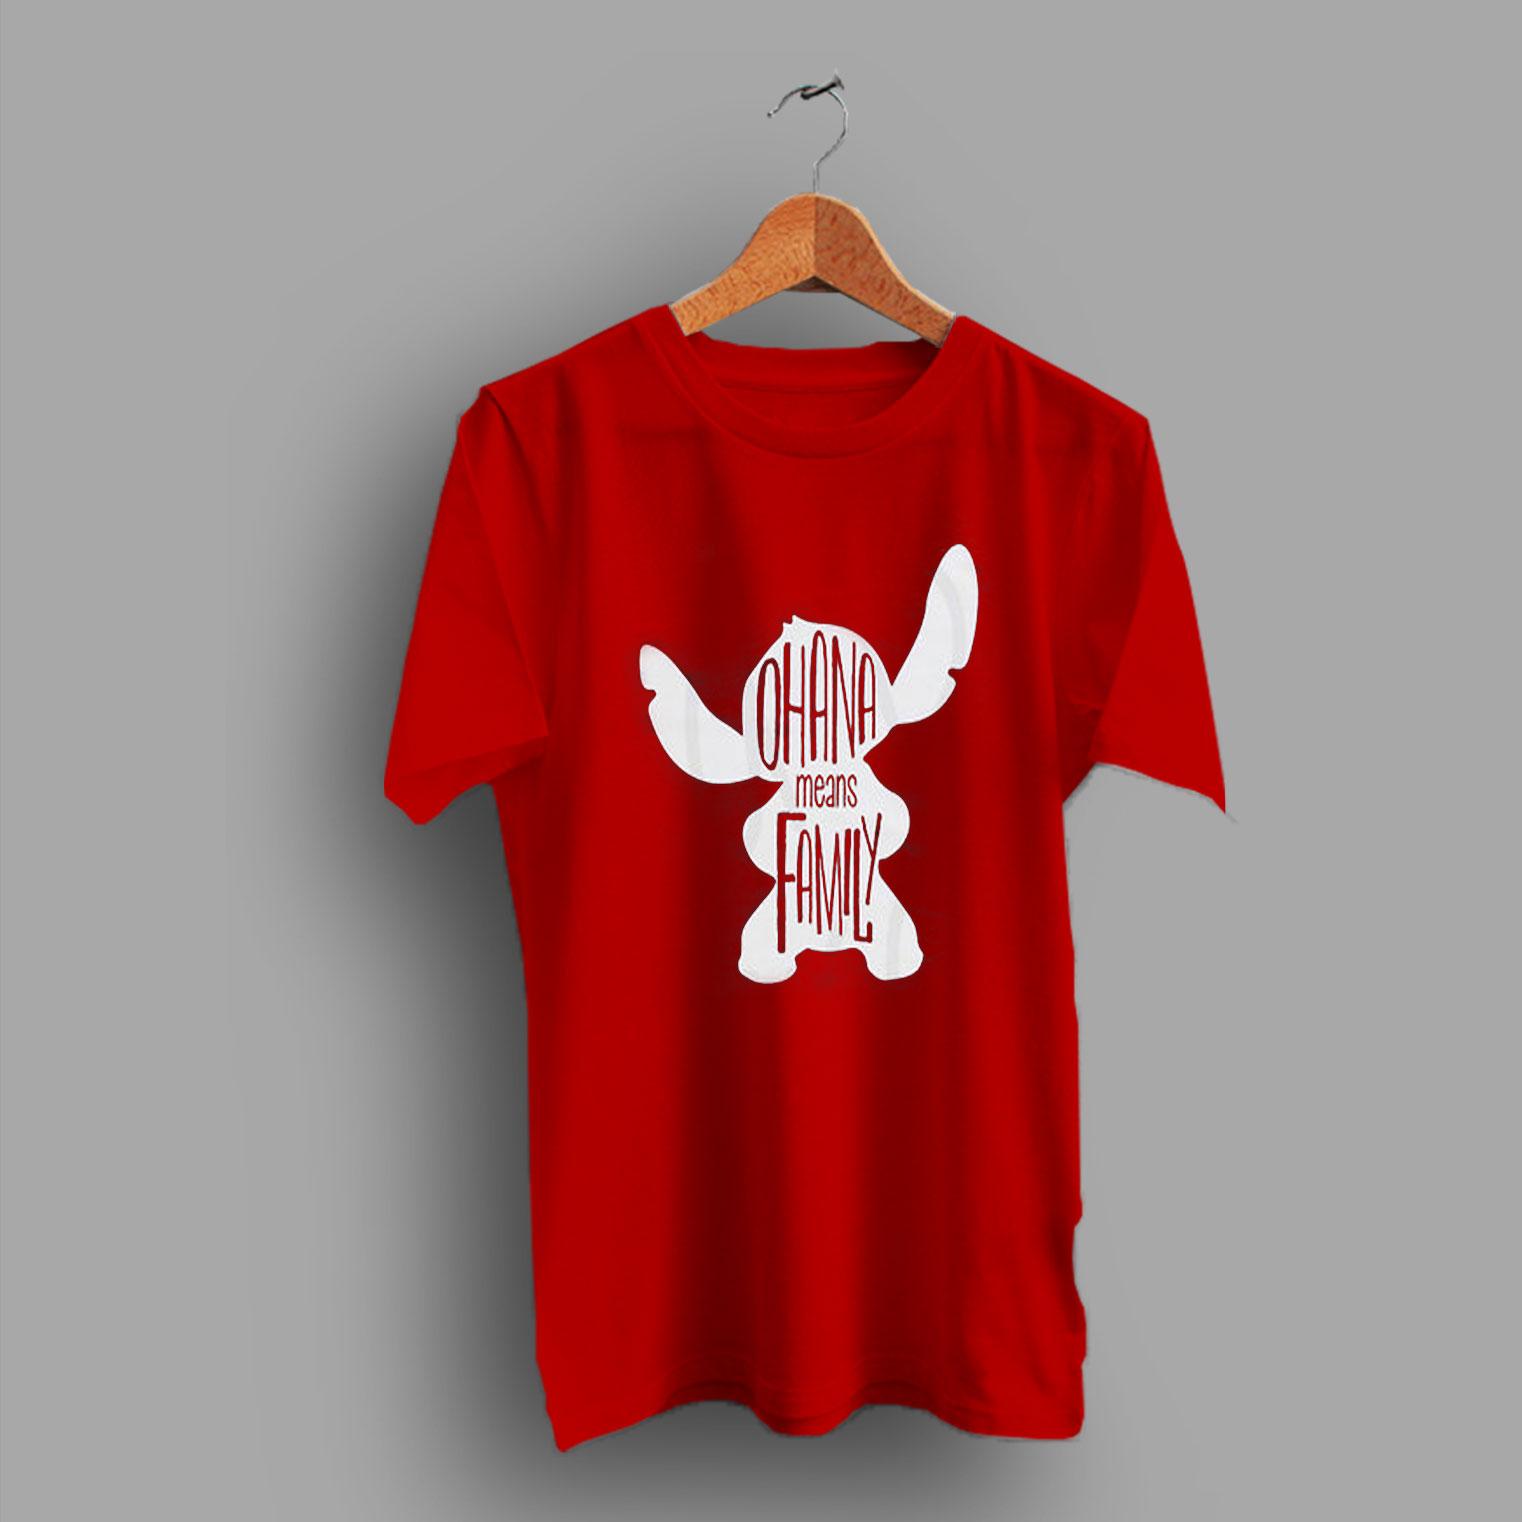 b714fc55 Vacation Matching Disney Trip Ohana Means Family T Shirt - HotVero